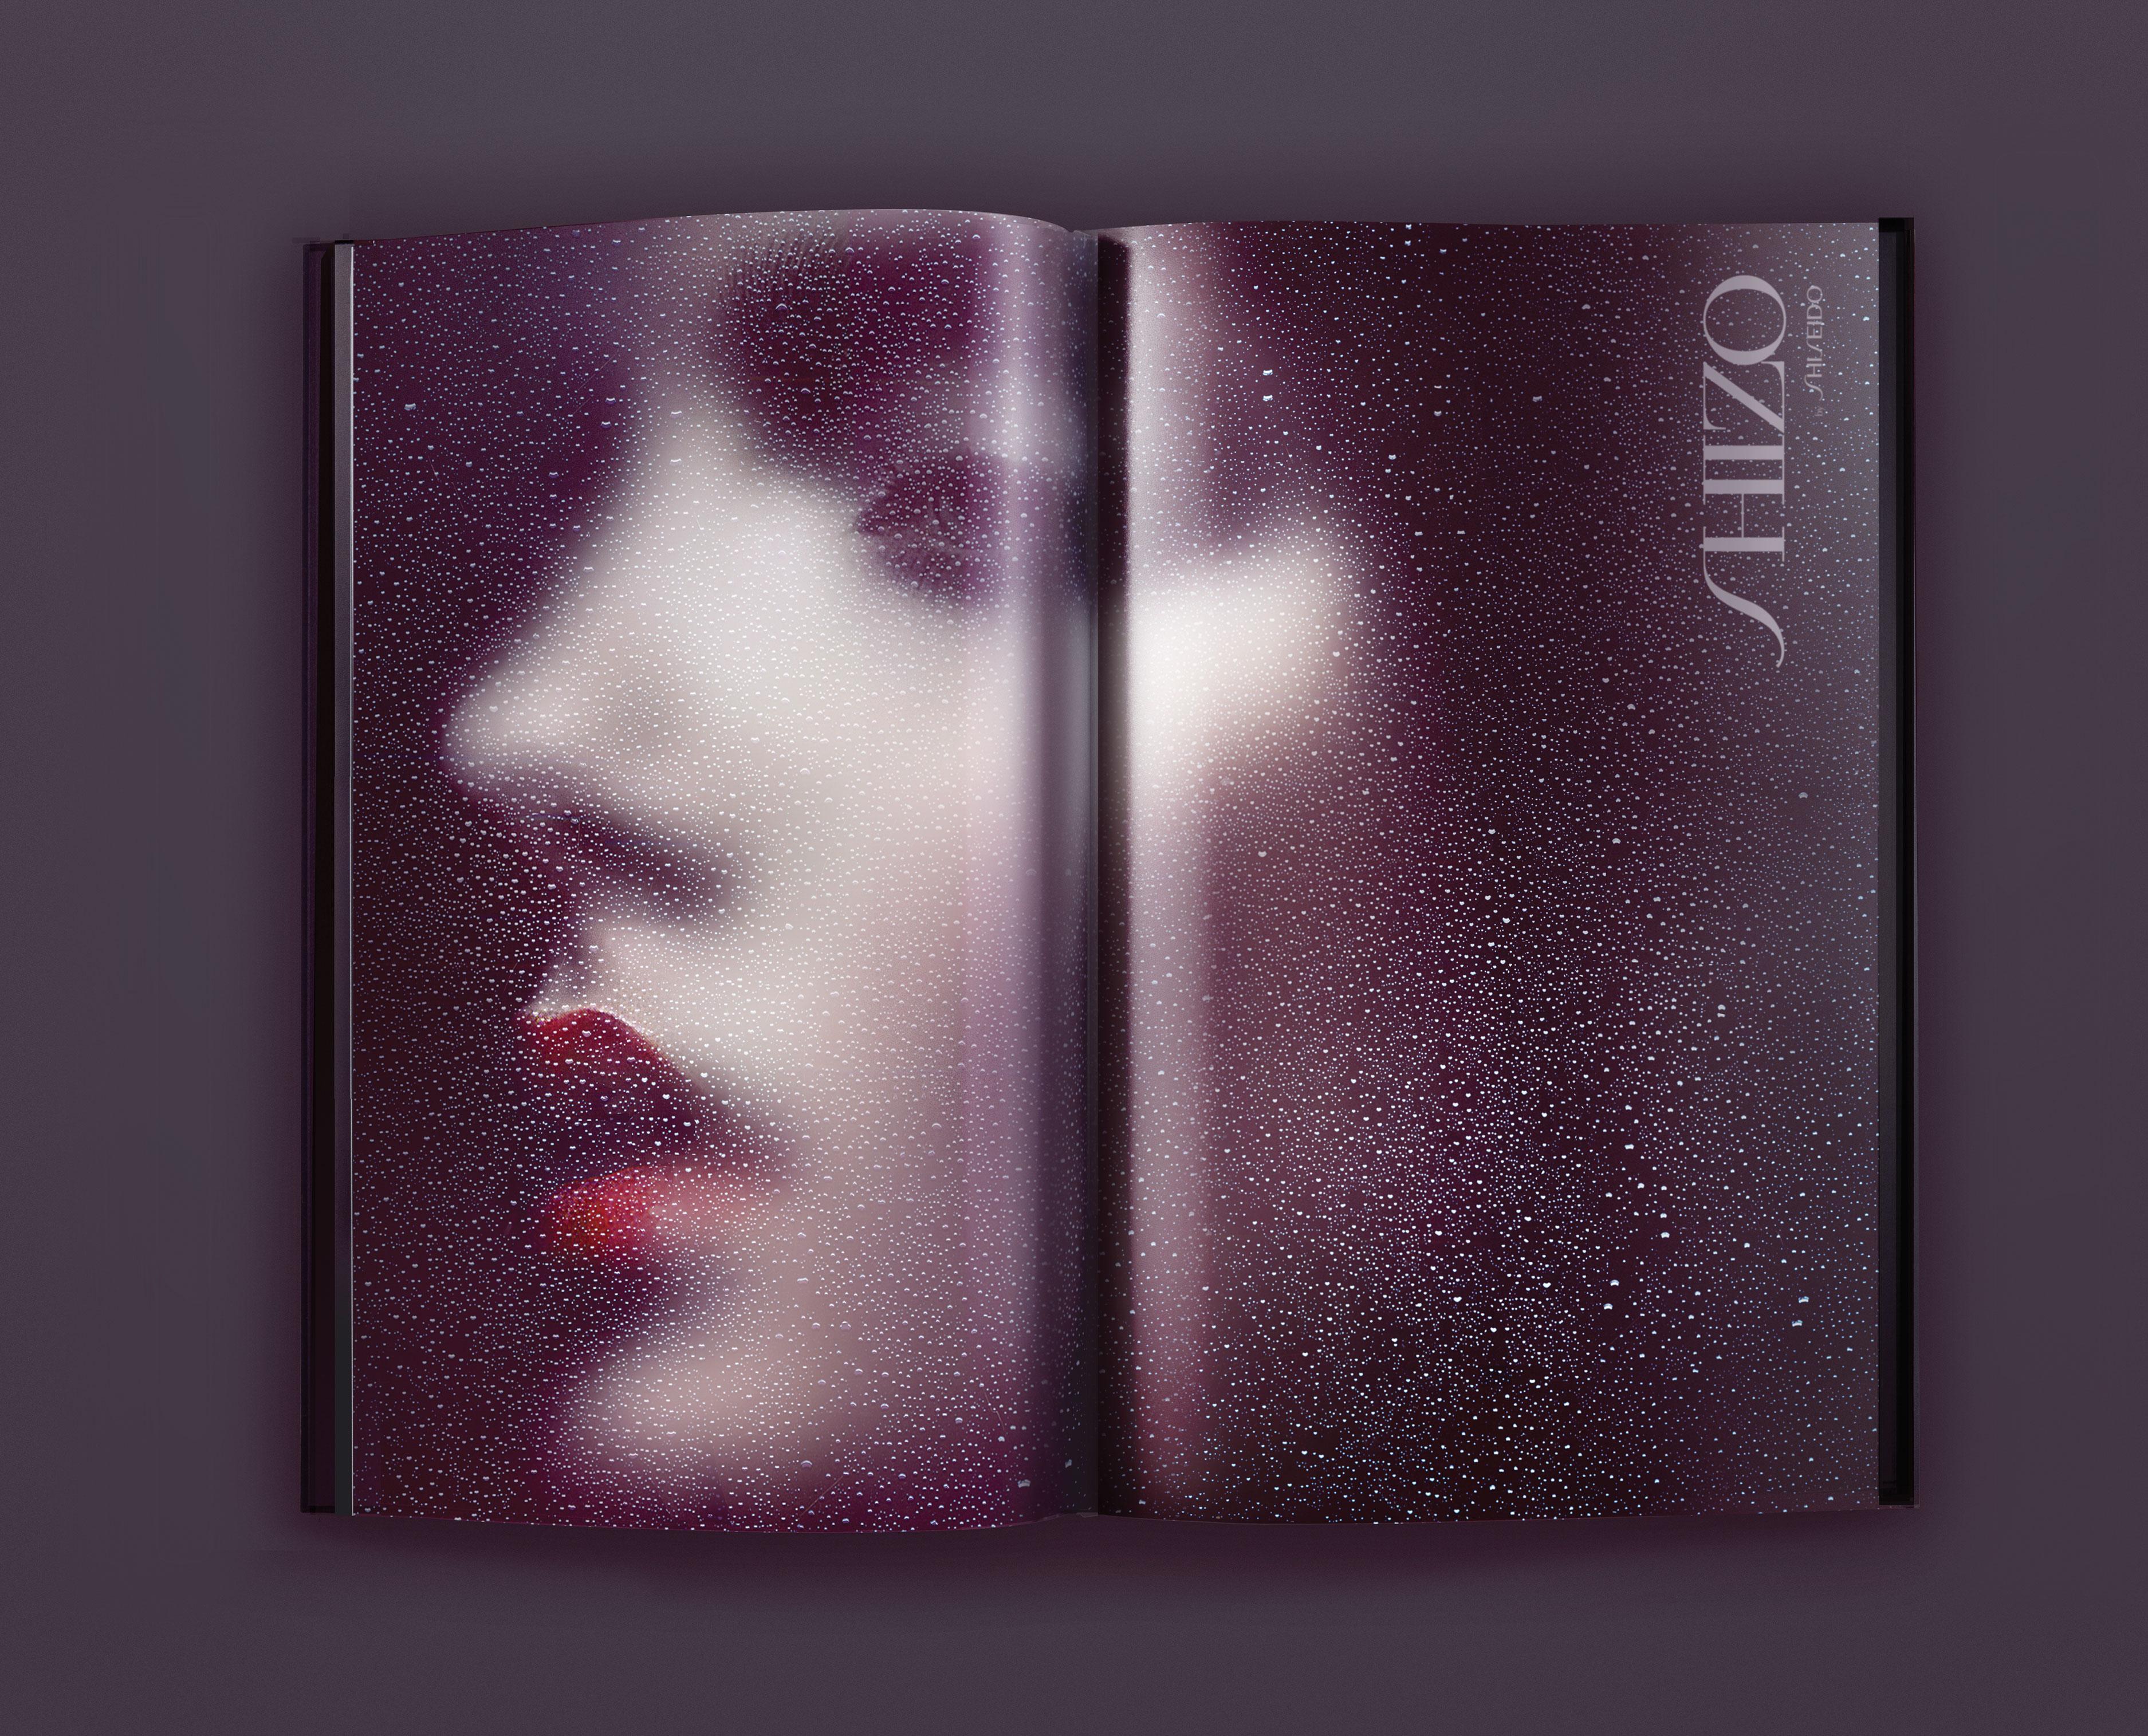 Shizo By Shiseido Dea Studio Creative Direction Branding Image Content